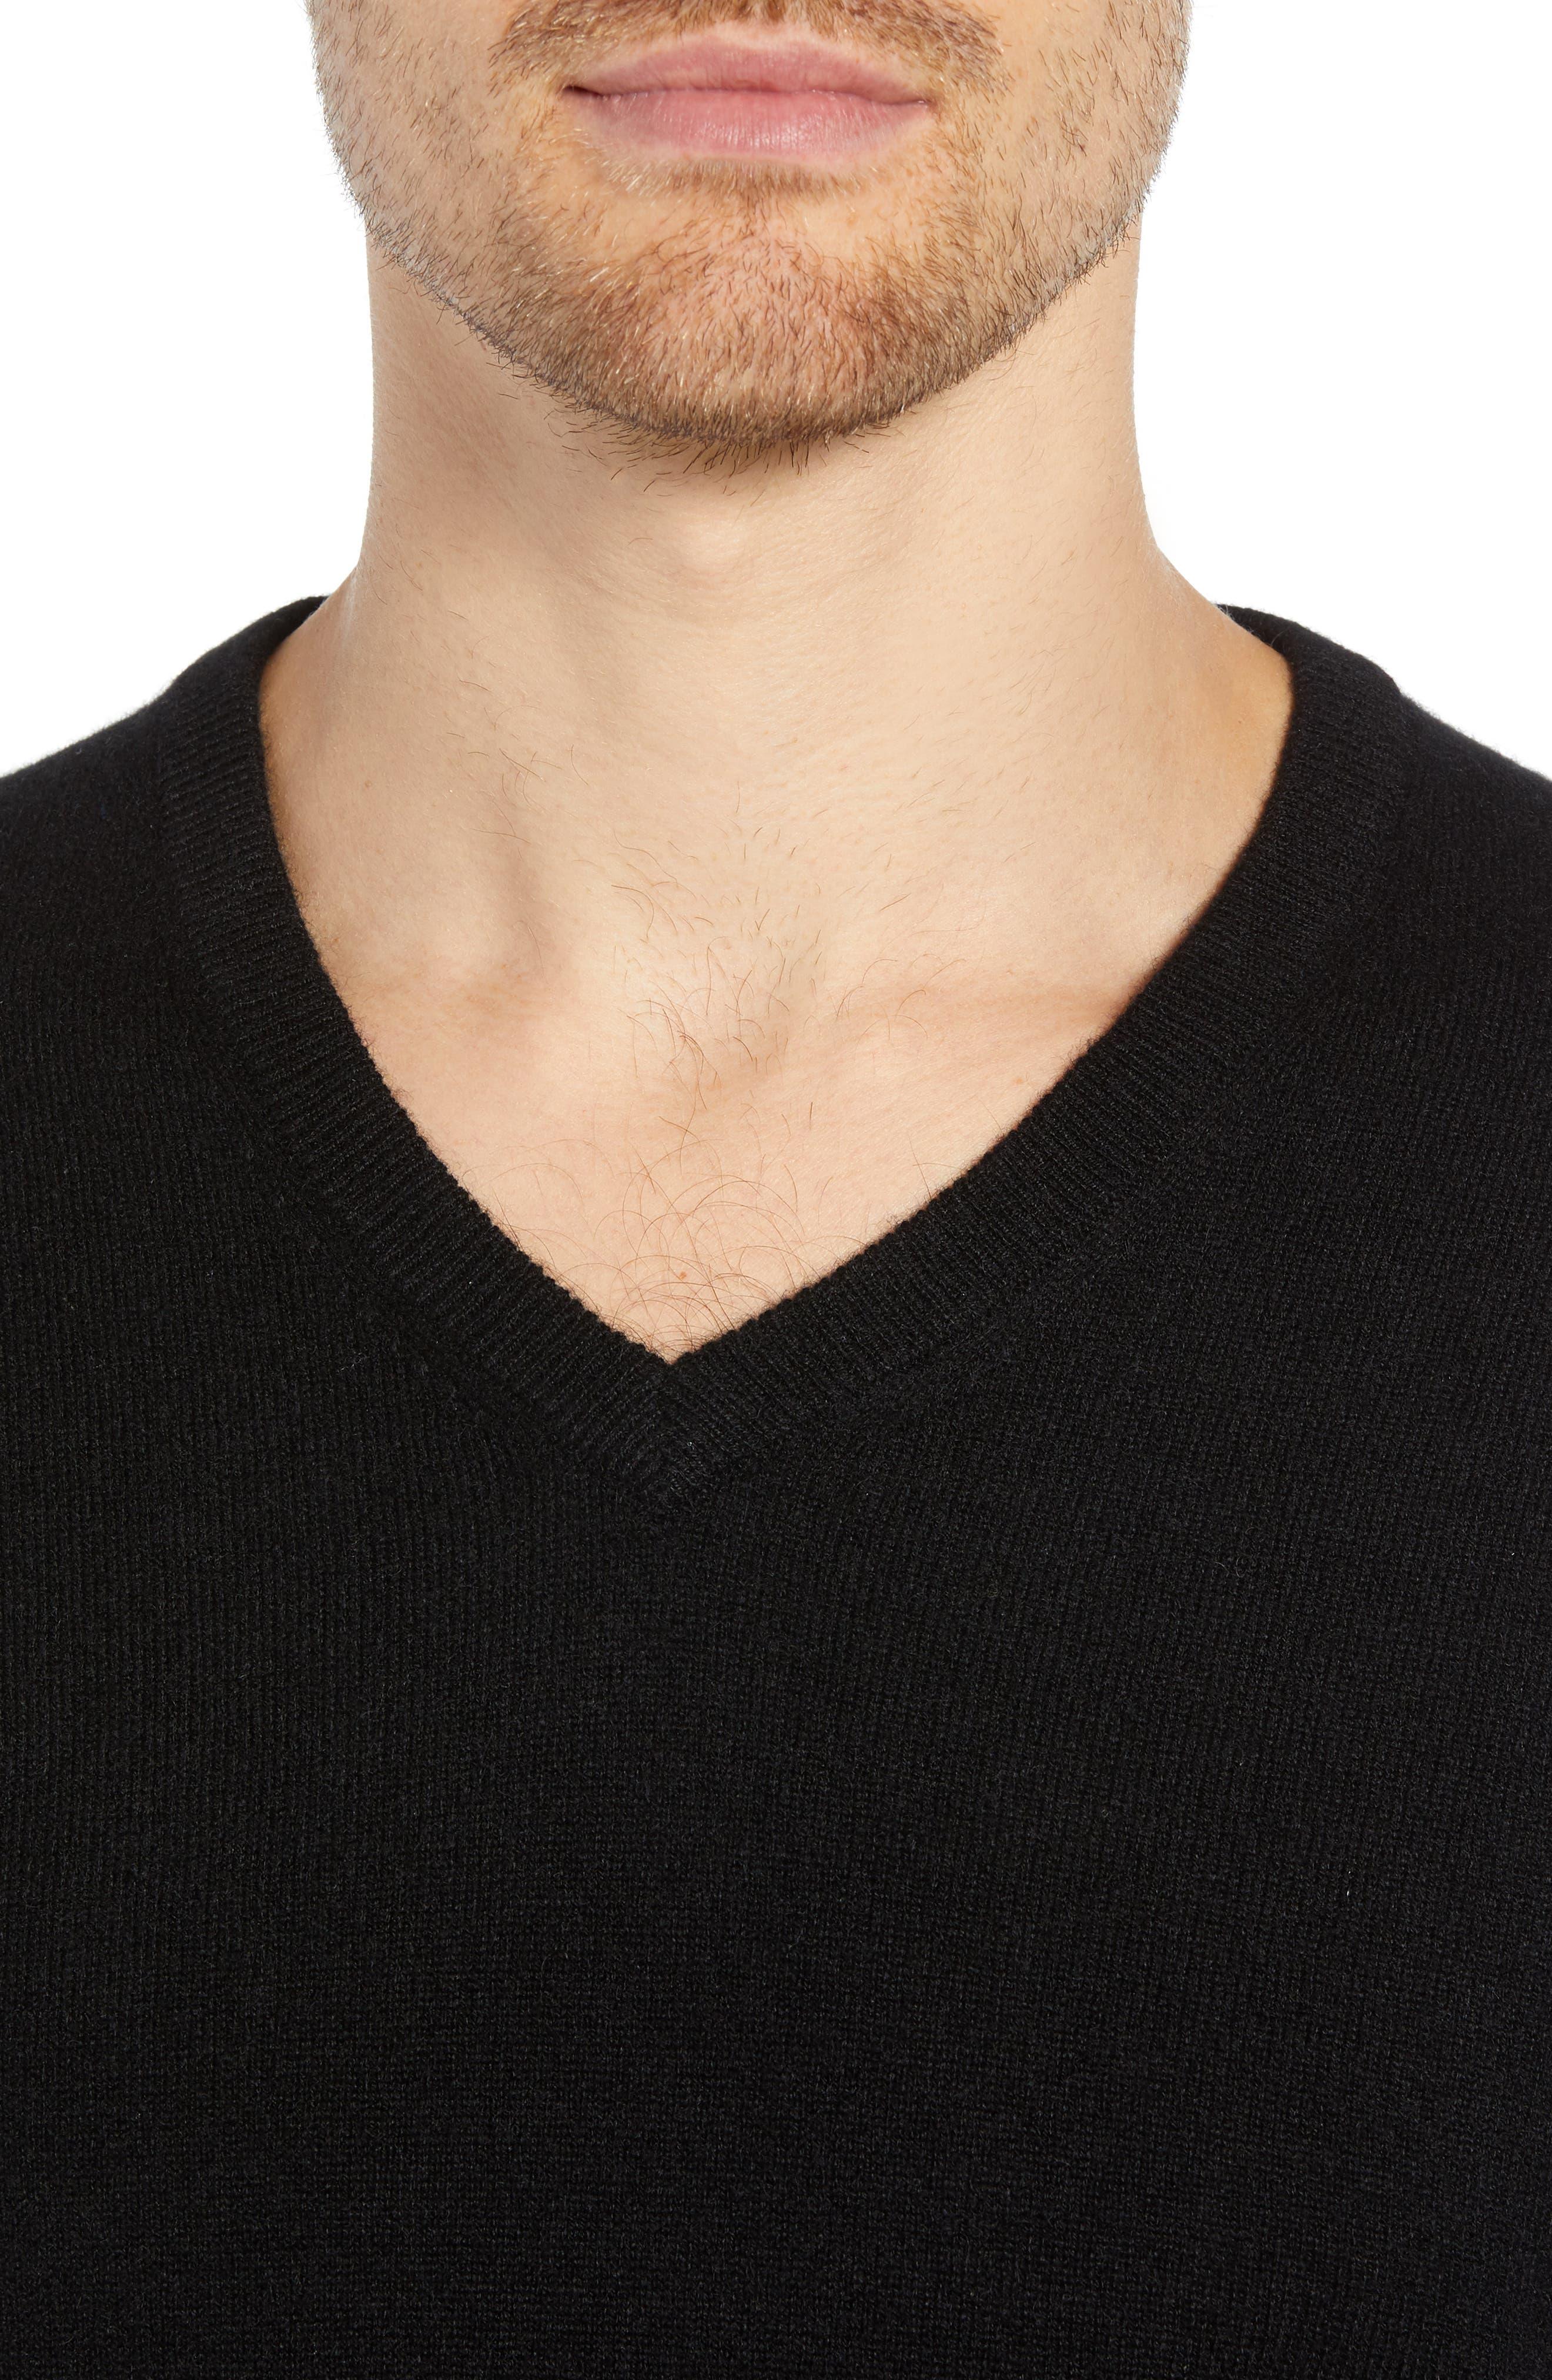 J.CREW,                             Everyday Cashmere Regular Fit V-Neck Sweater,                             Alternate thumbnail 4, color,                             001